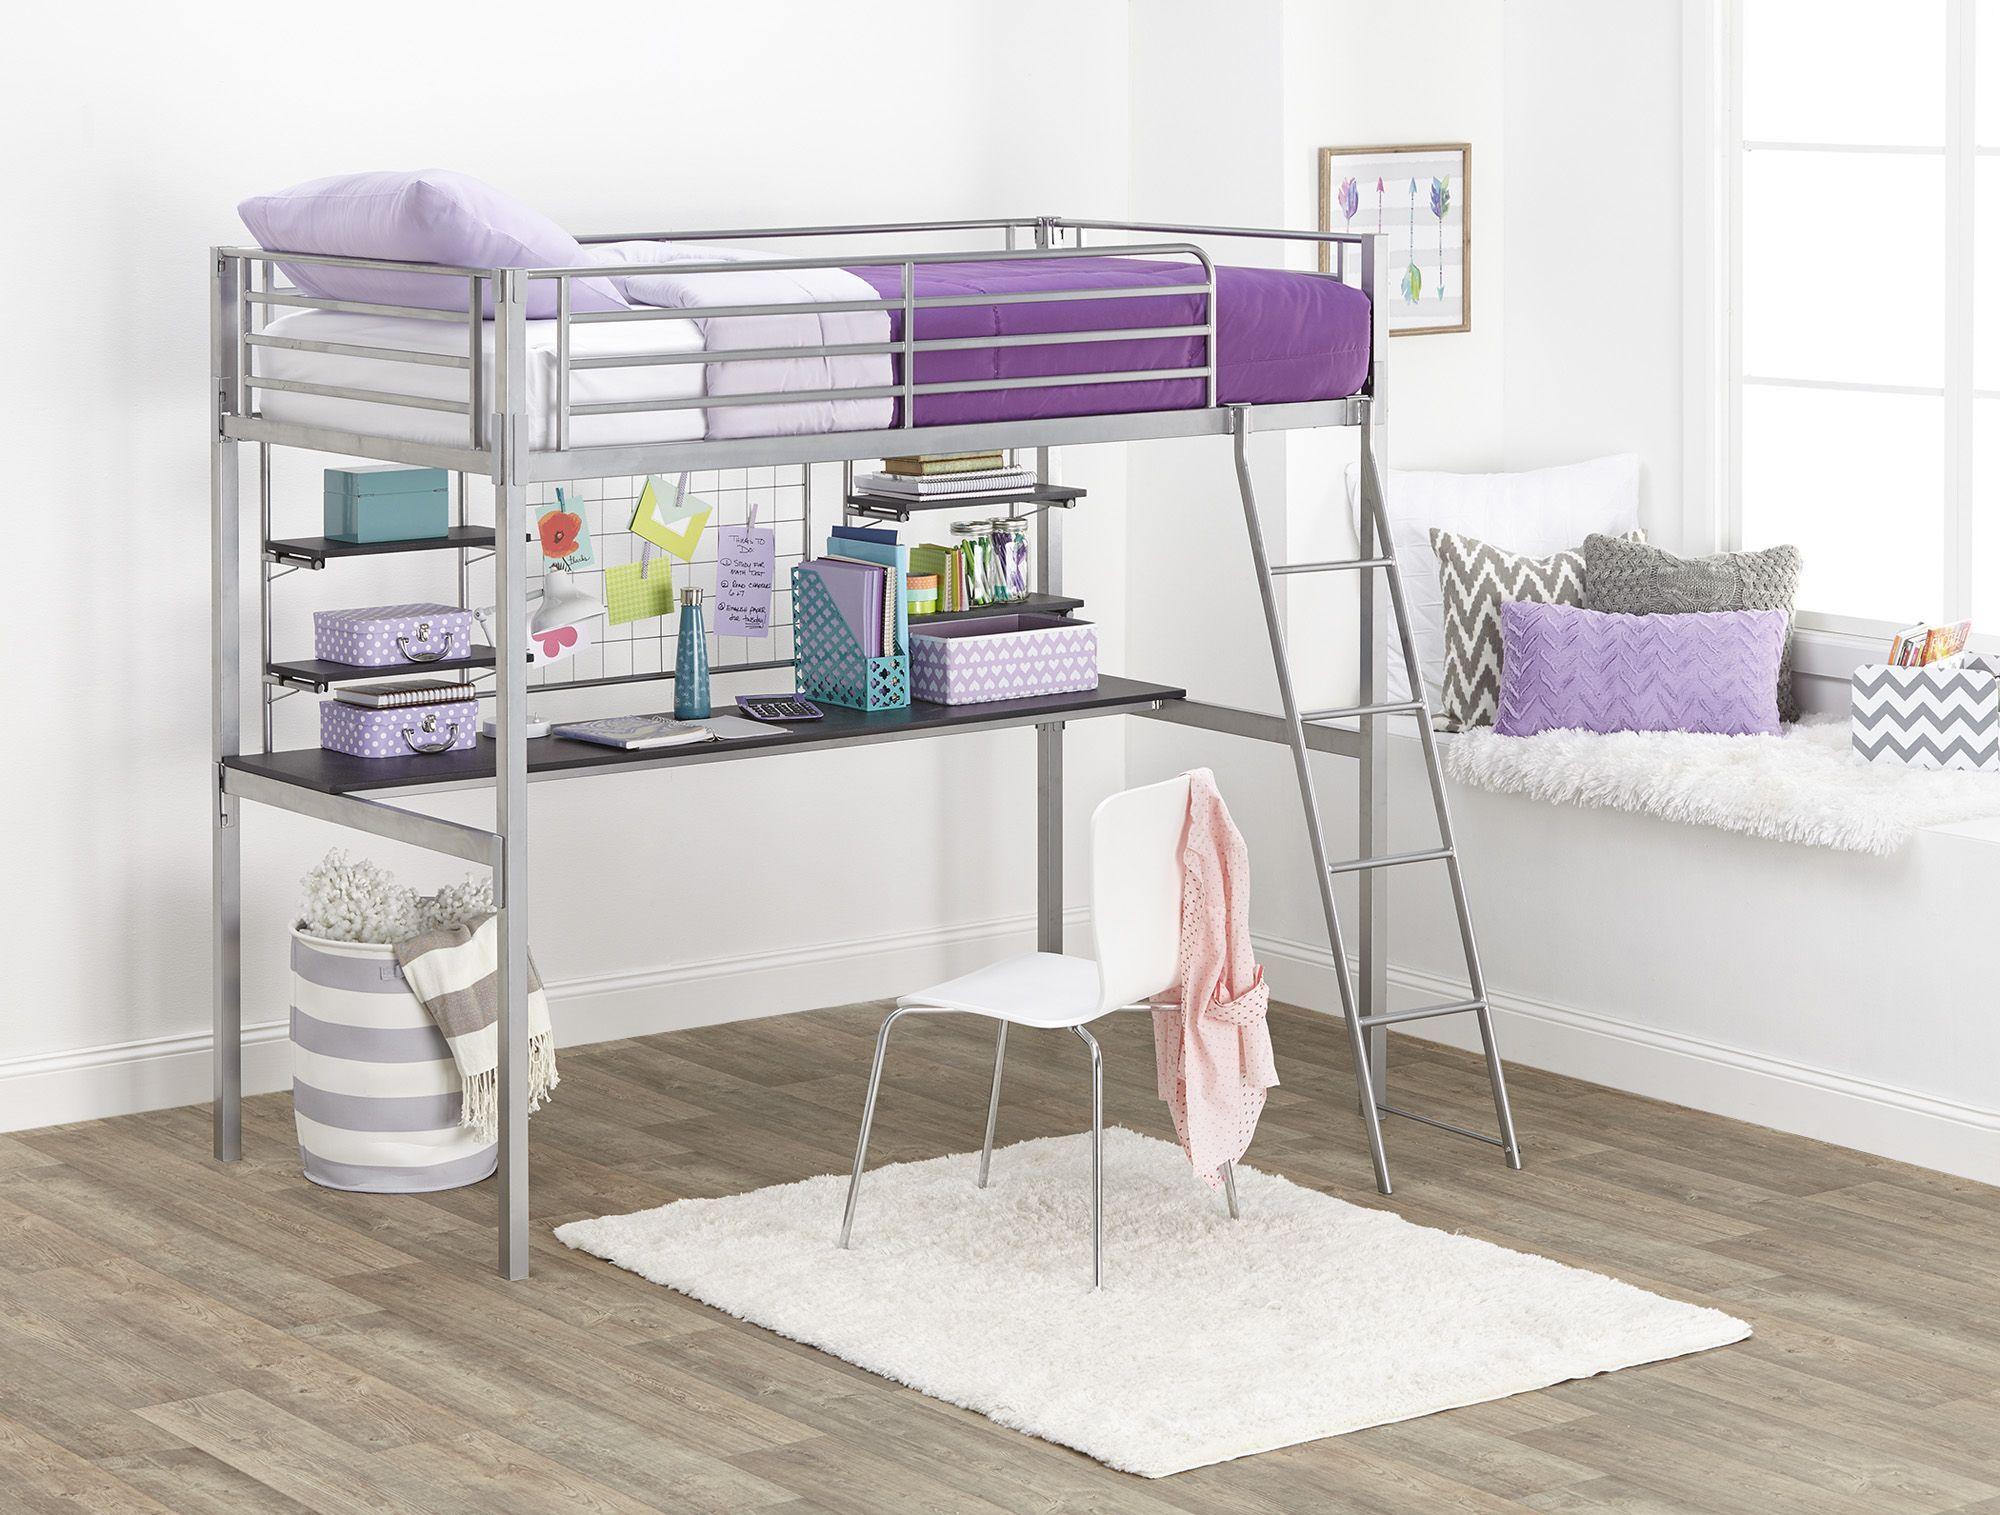 Fingerhut Kimball Kids Boltzero Study Loft Bunk Bed Loft Bunk